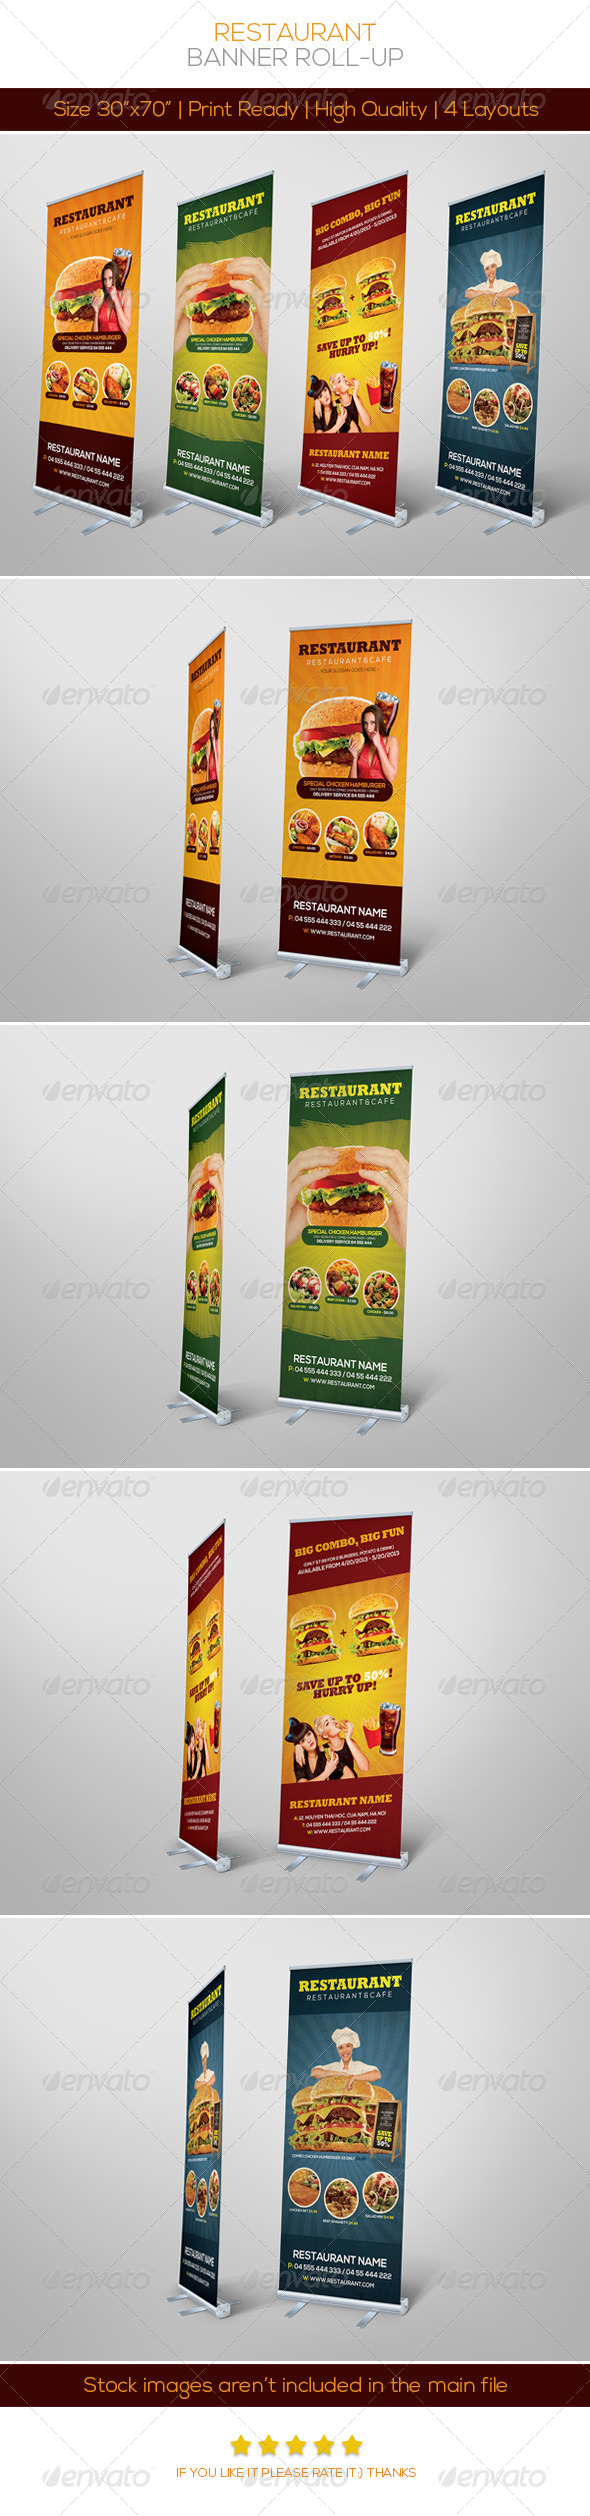 GraphicRiver Premium Restaurant Banner Roll-up 4976693